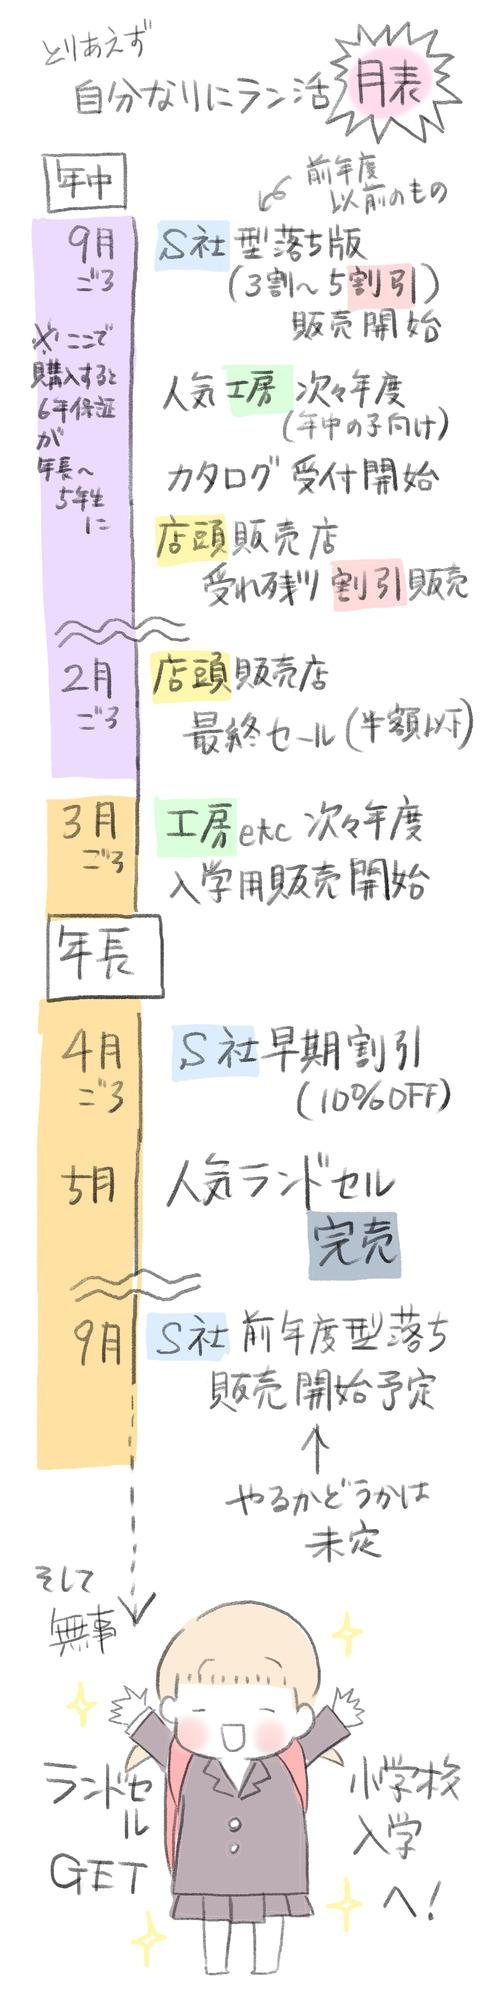 C4F1CEB6-92D8-4F0C-8D70-BE435FBE526D